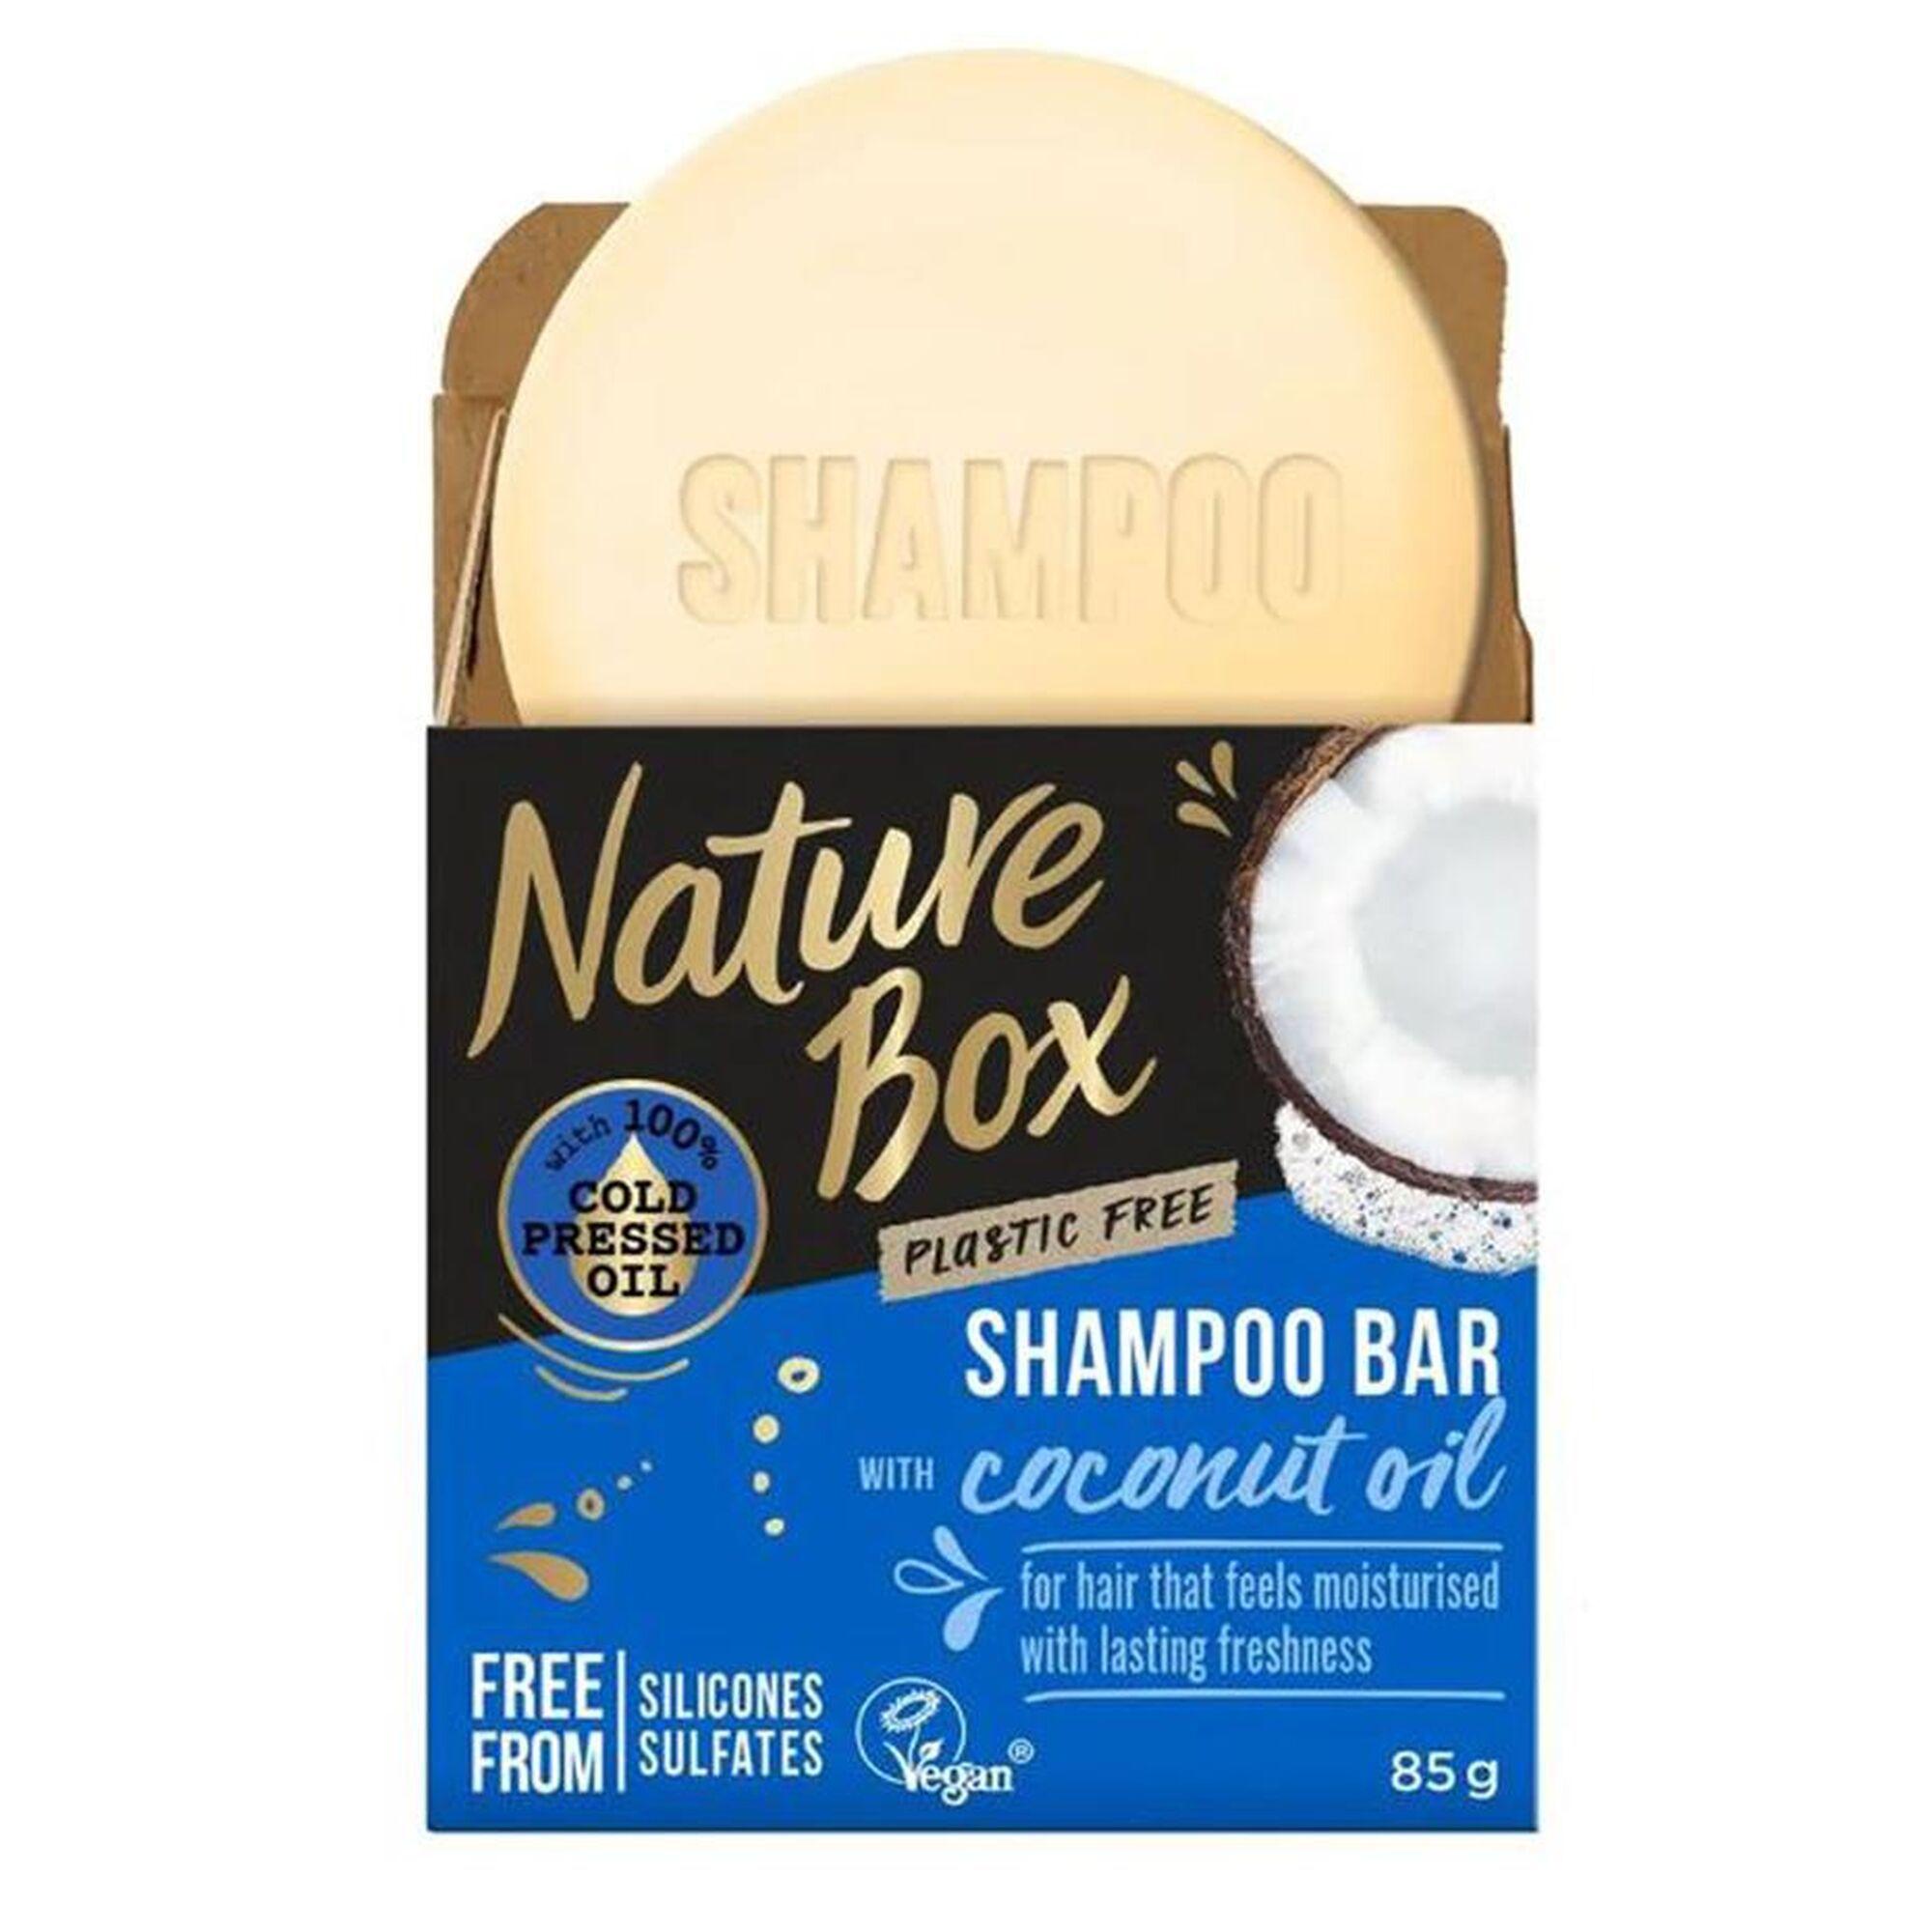 Shampoo Bar with Coconut Oil Shampoo bar NATURE BOX